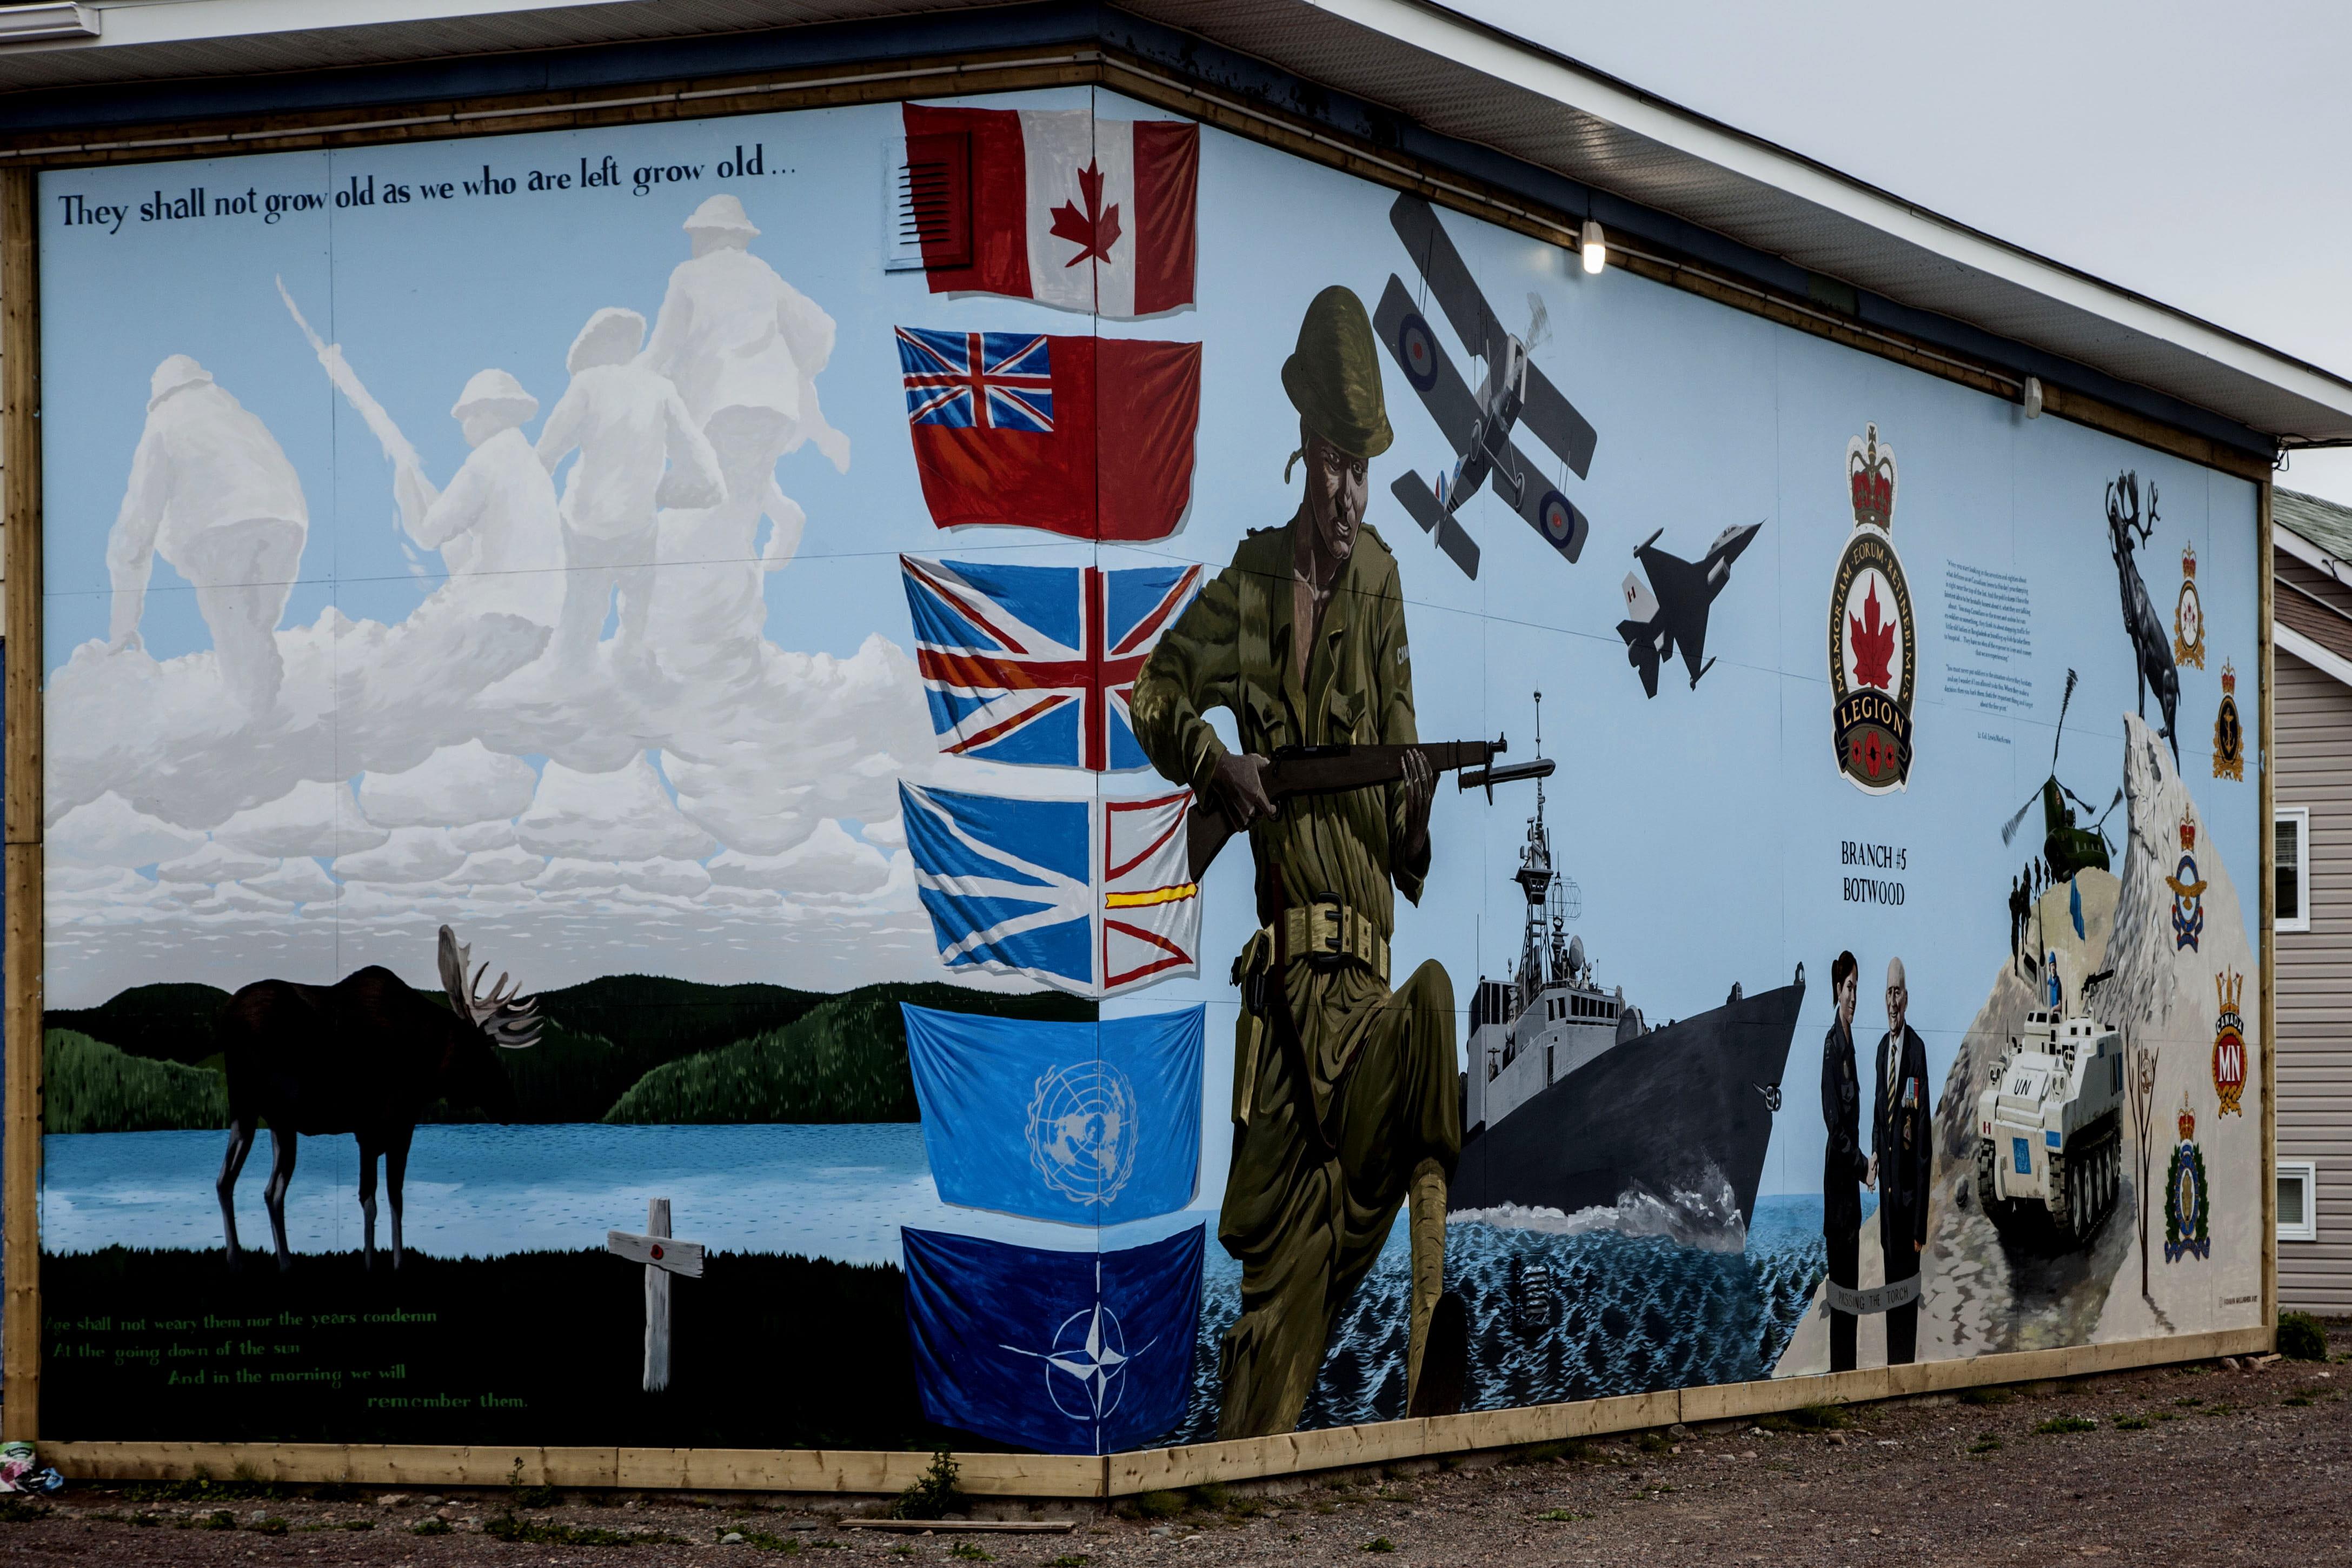 Honouring Our Fallen mural, Botwood